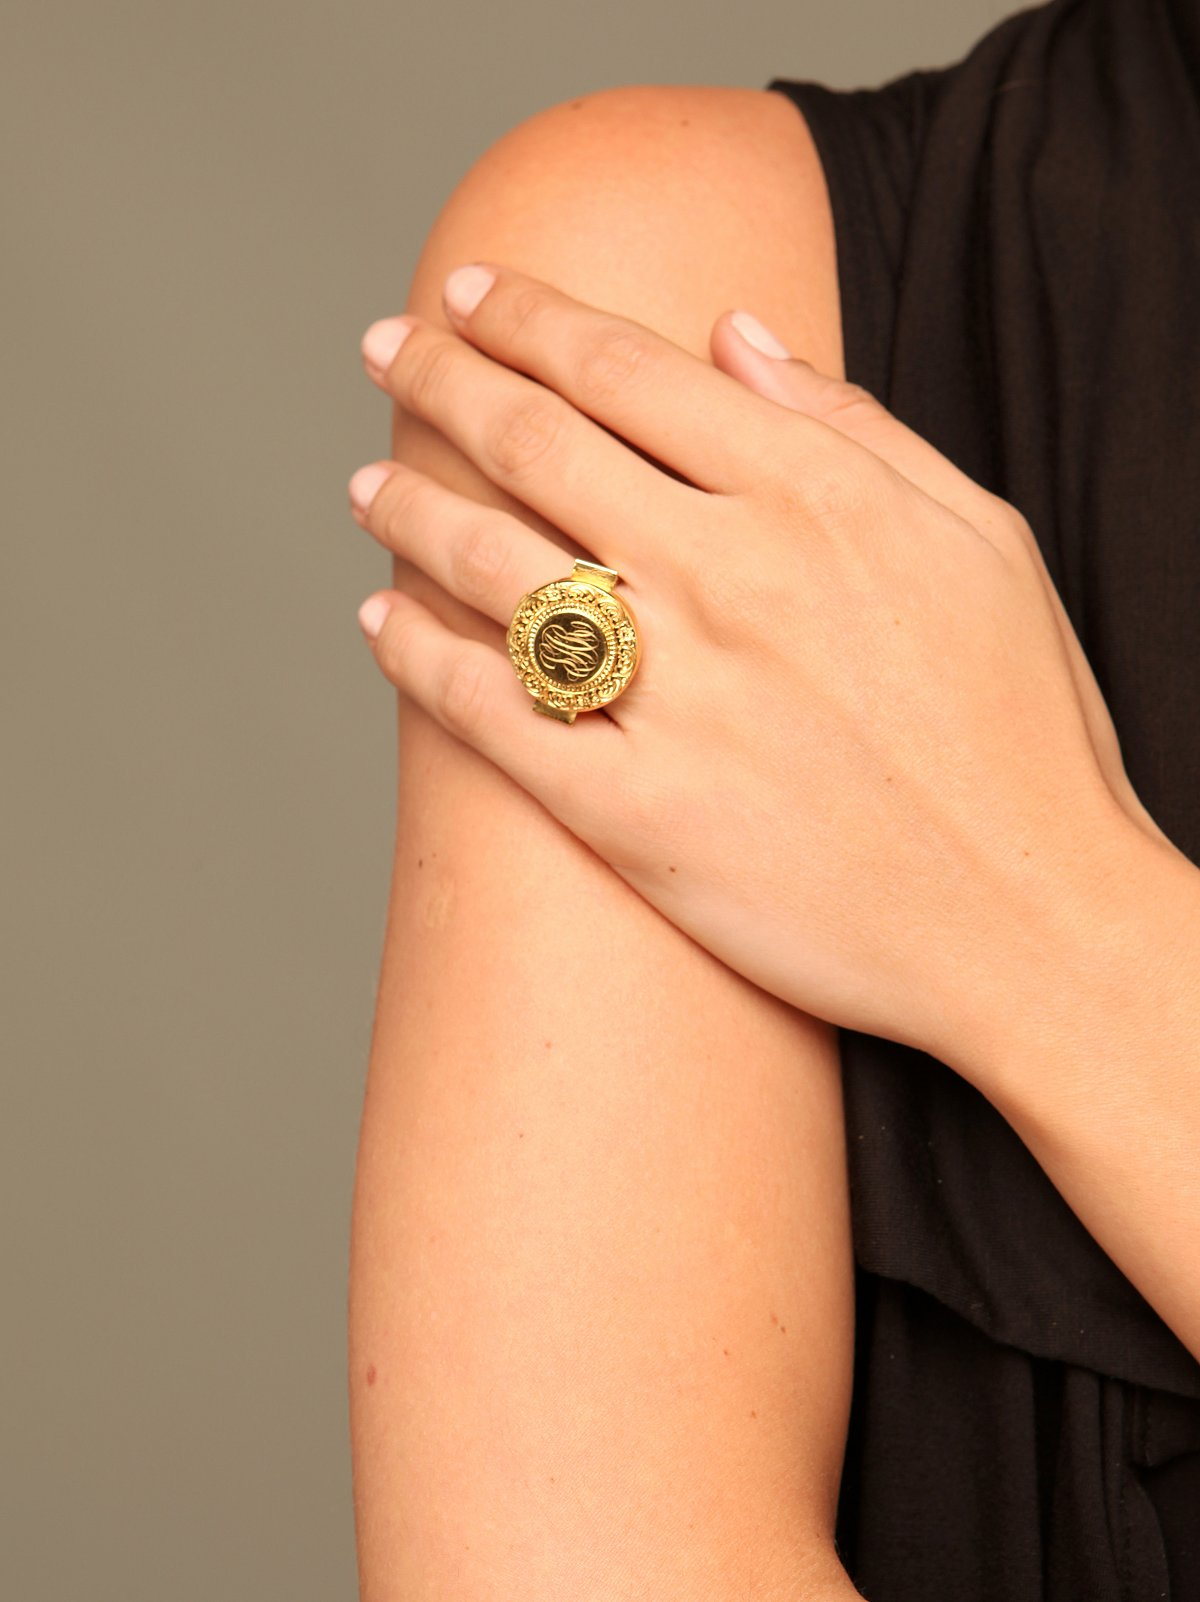 Vintage Locket Cocktail Ring